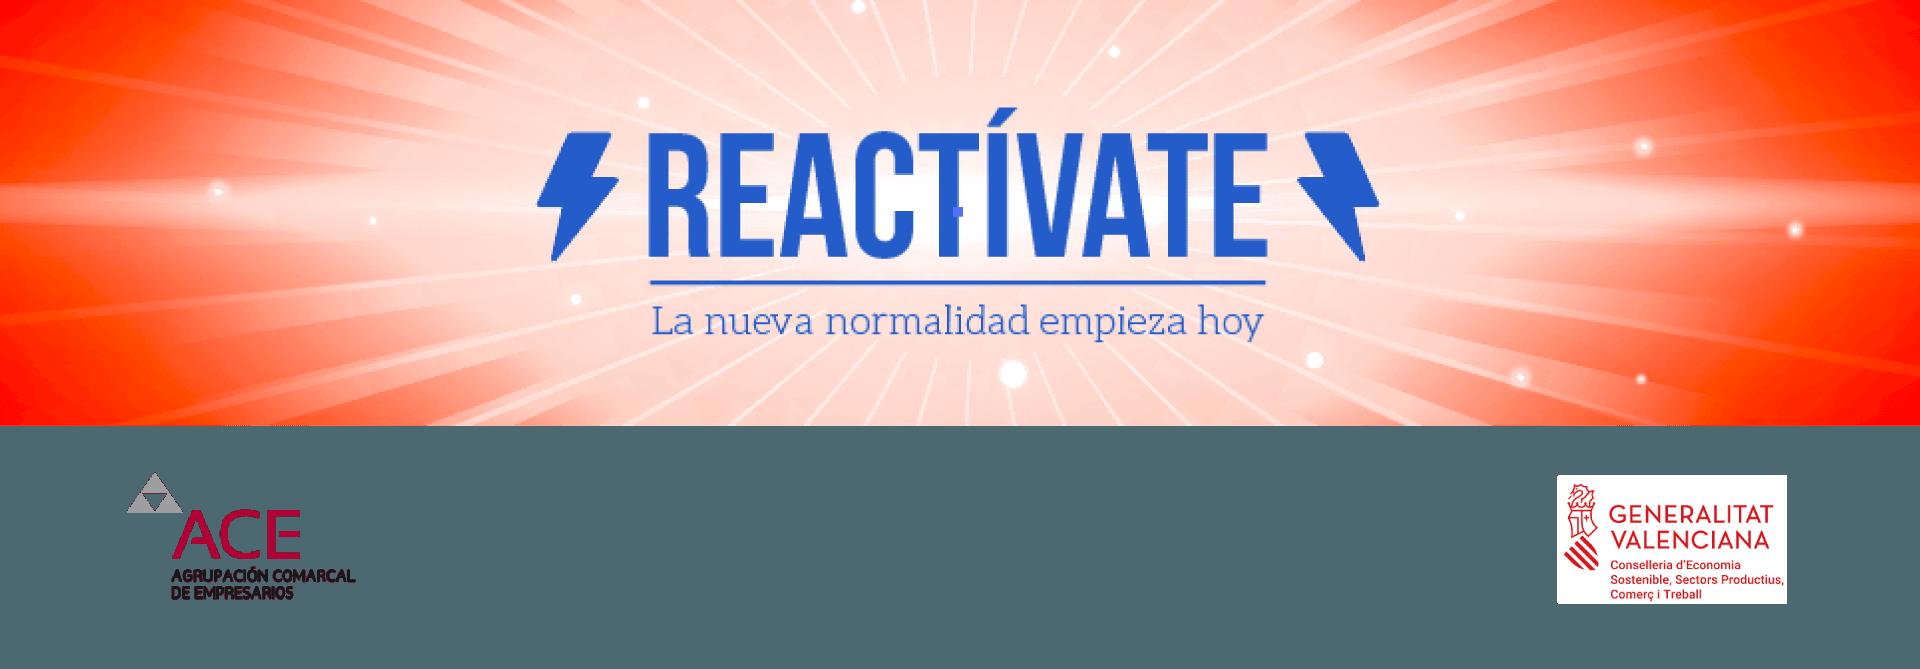 cabecera_reactivate_acefides2